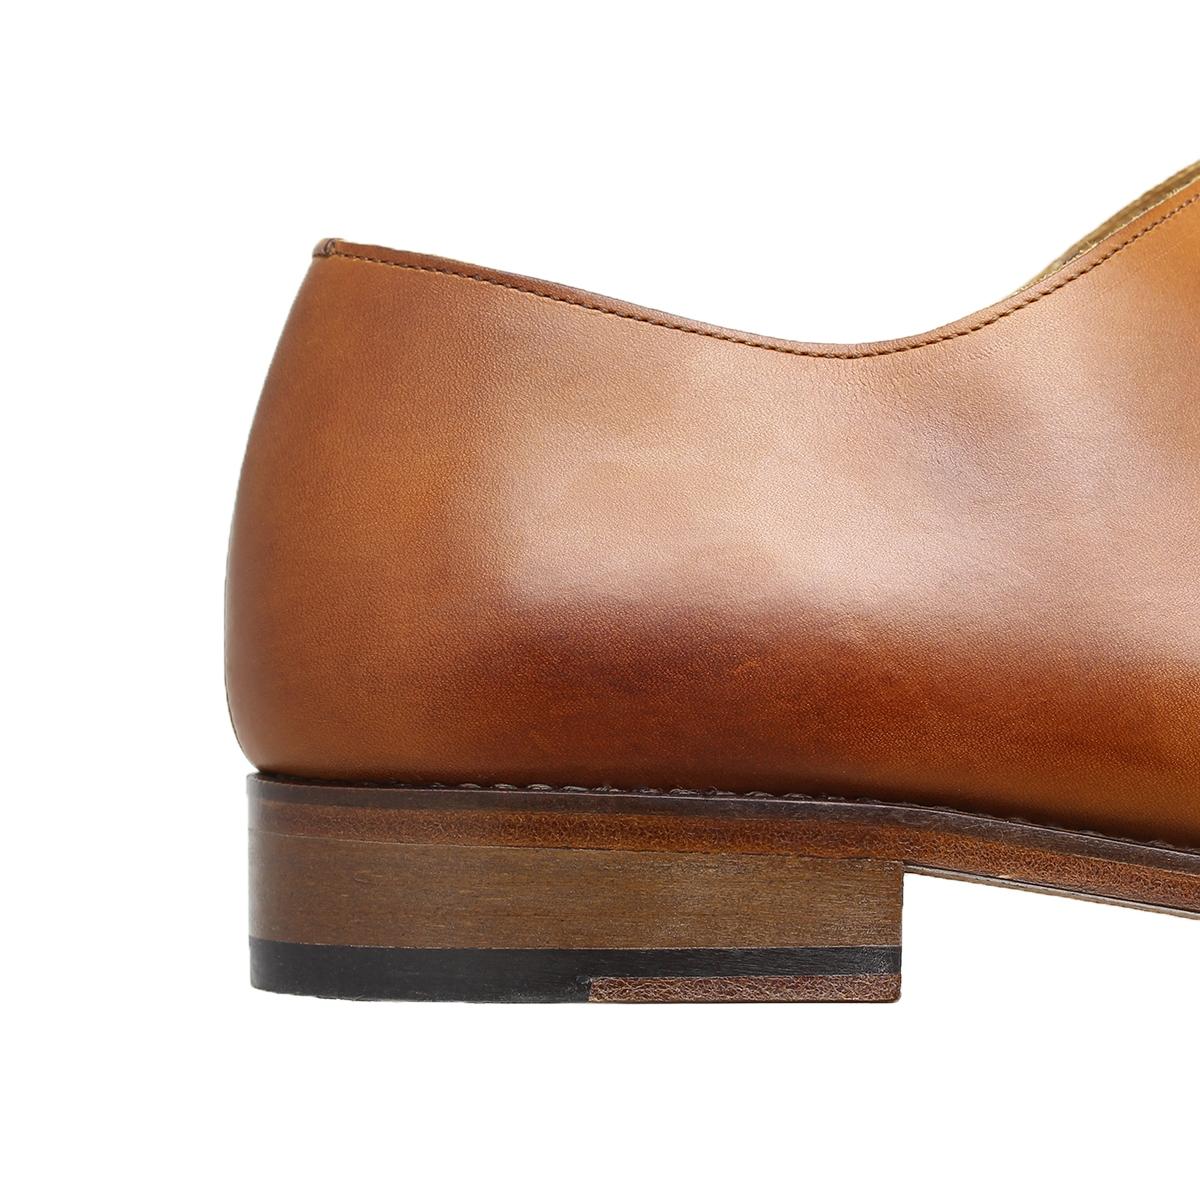 chaussures en daim abimees comment nettoyer chaussures daim pluie. Black Bedroom Furniture Sets. Home Design Ideas